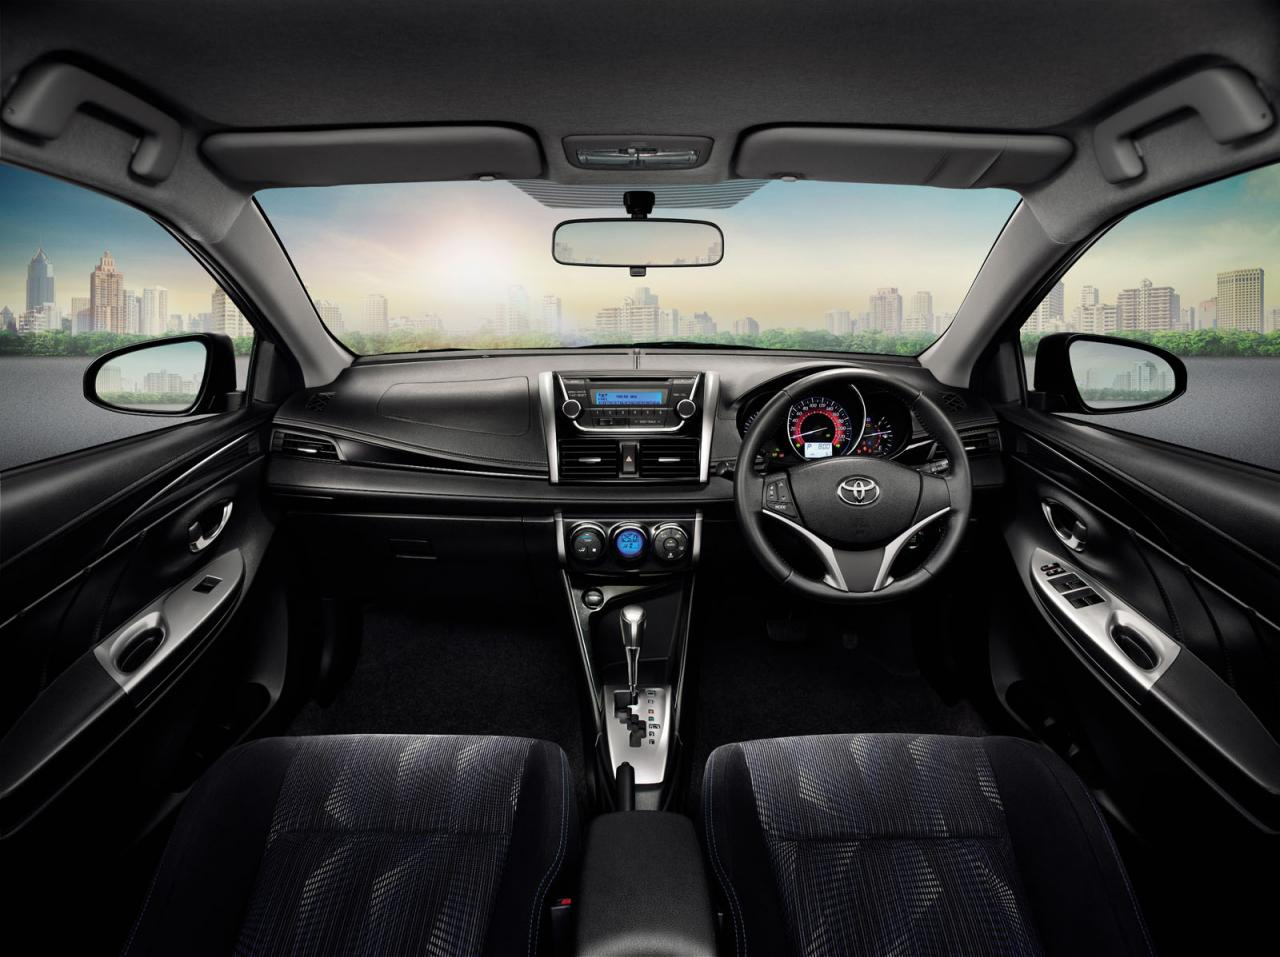 [Resim: Toyota+Vios+3.jpg]